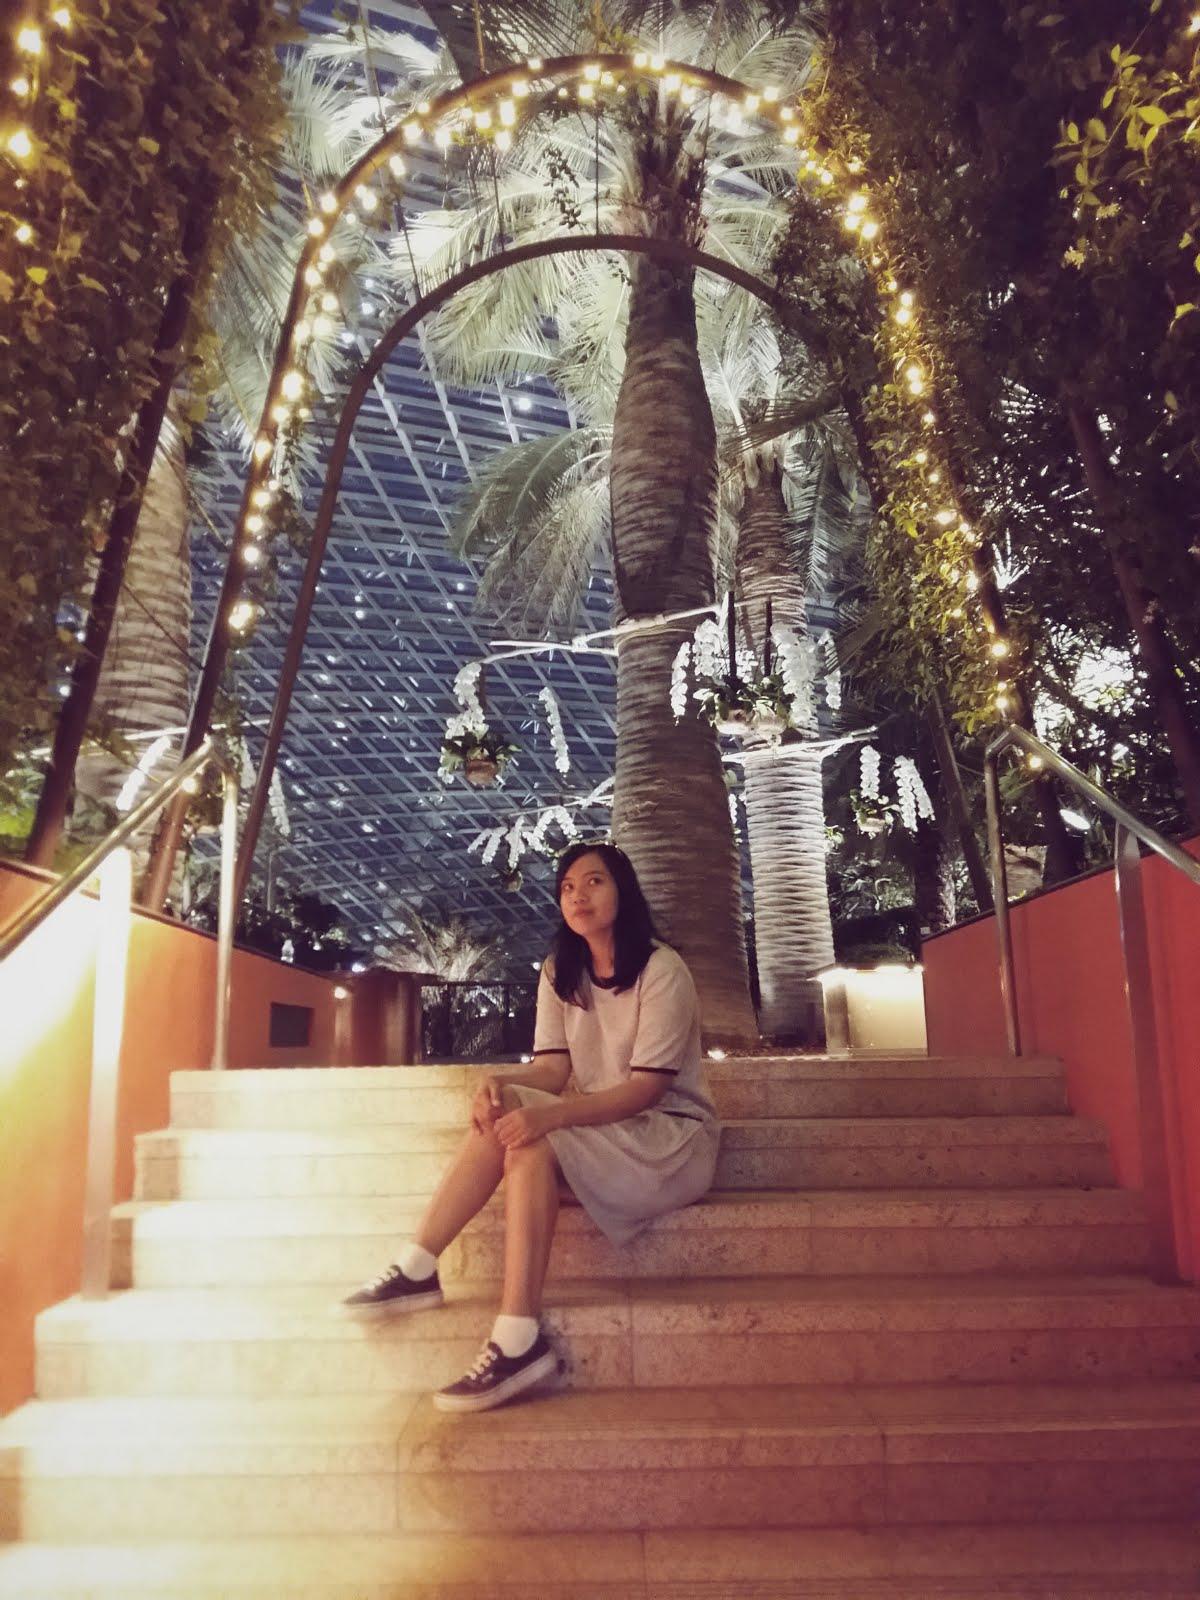 Travel to Singapore, 2016